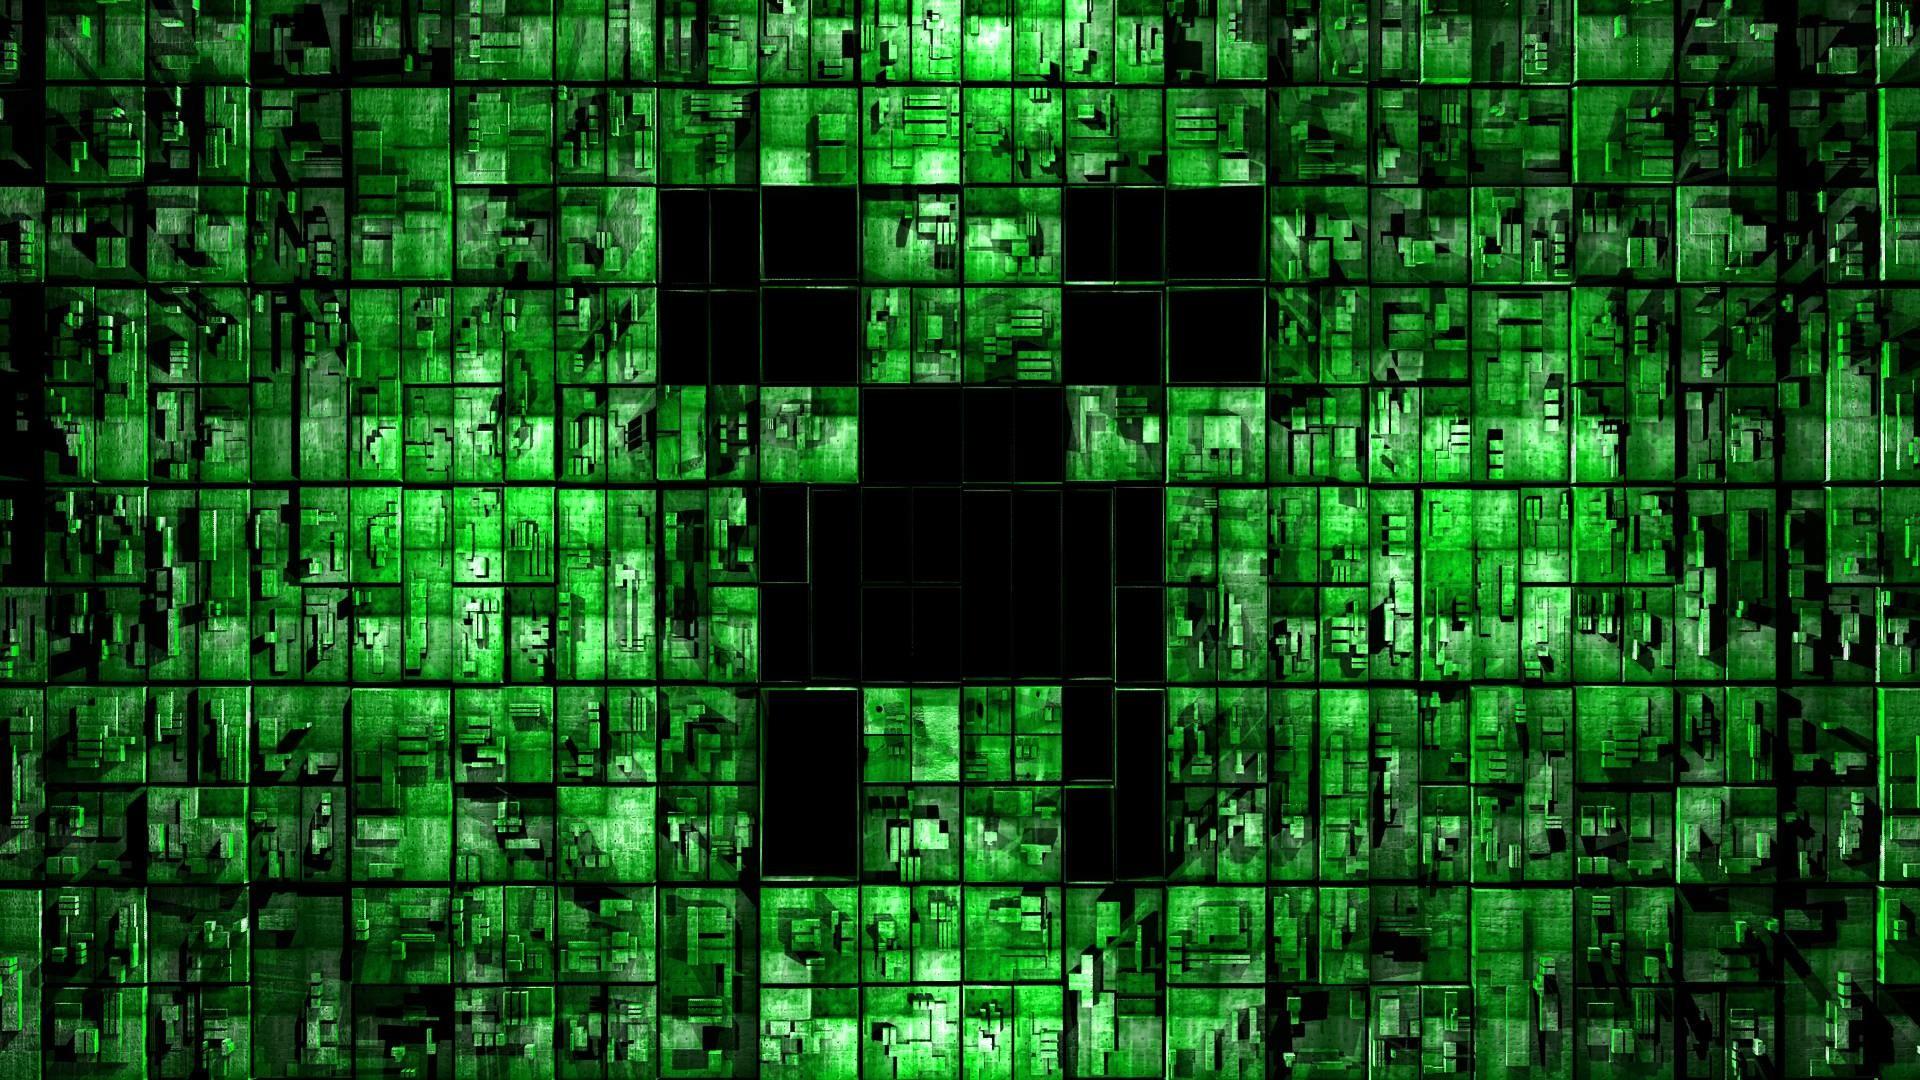 Most Inspiring Wallpaper Minecraft Kawaii - 602181-download-free-minecraft-creeper-backgrounds-1920x1080-mobile  Image_734850.jpg